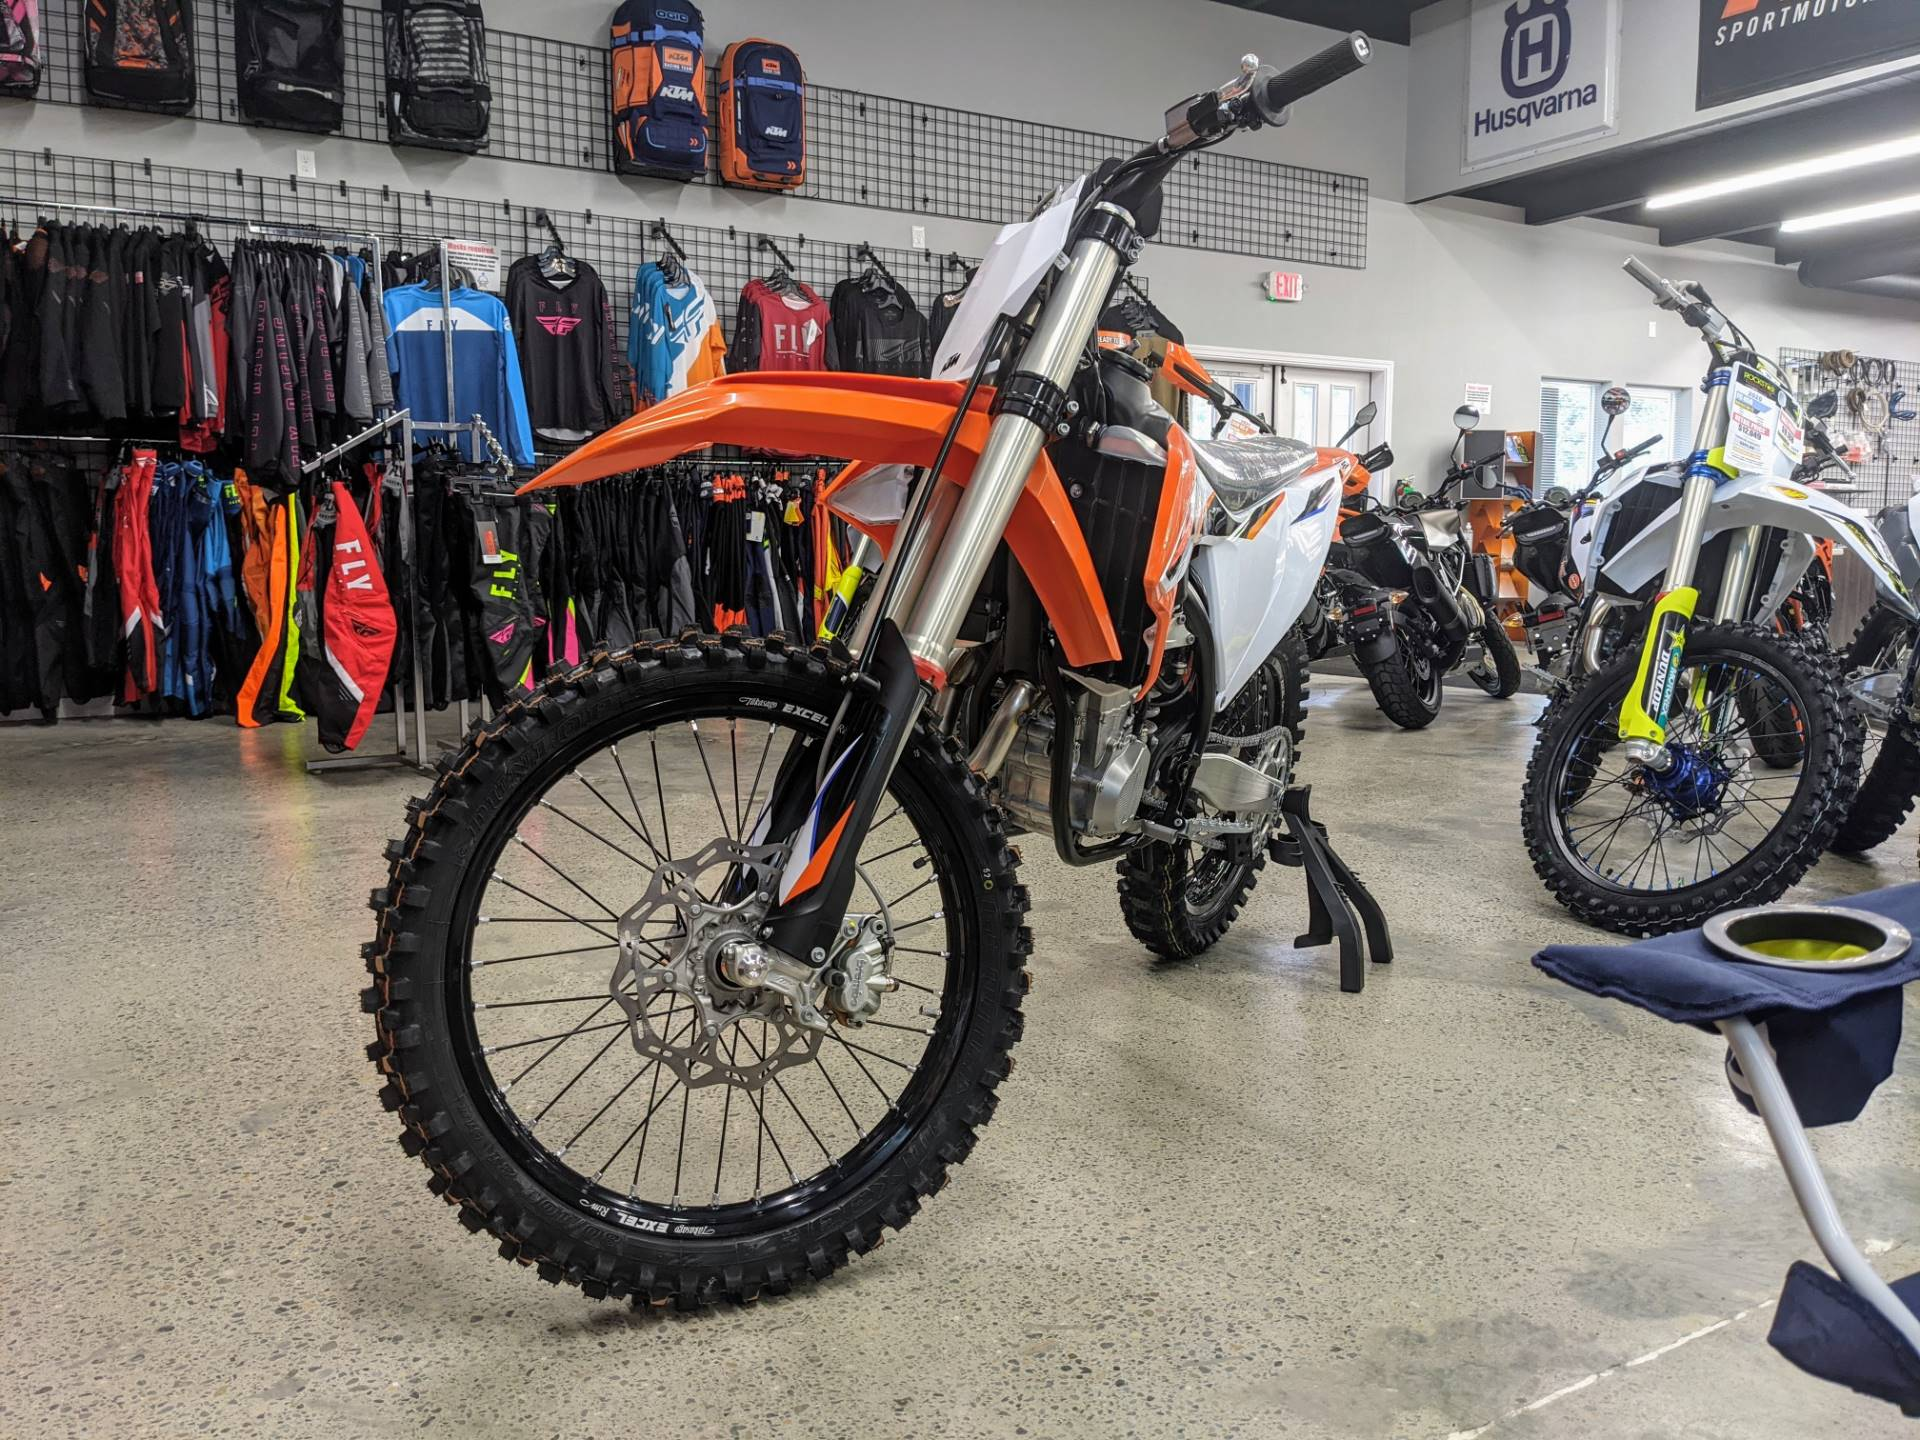 New 2021 Ktm 450 Sx F Motorcycles In Gresham Or K319970 Orange